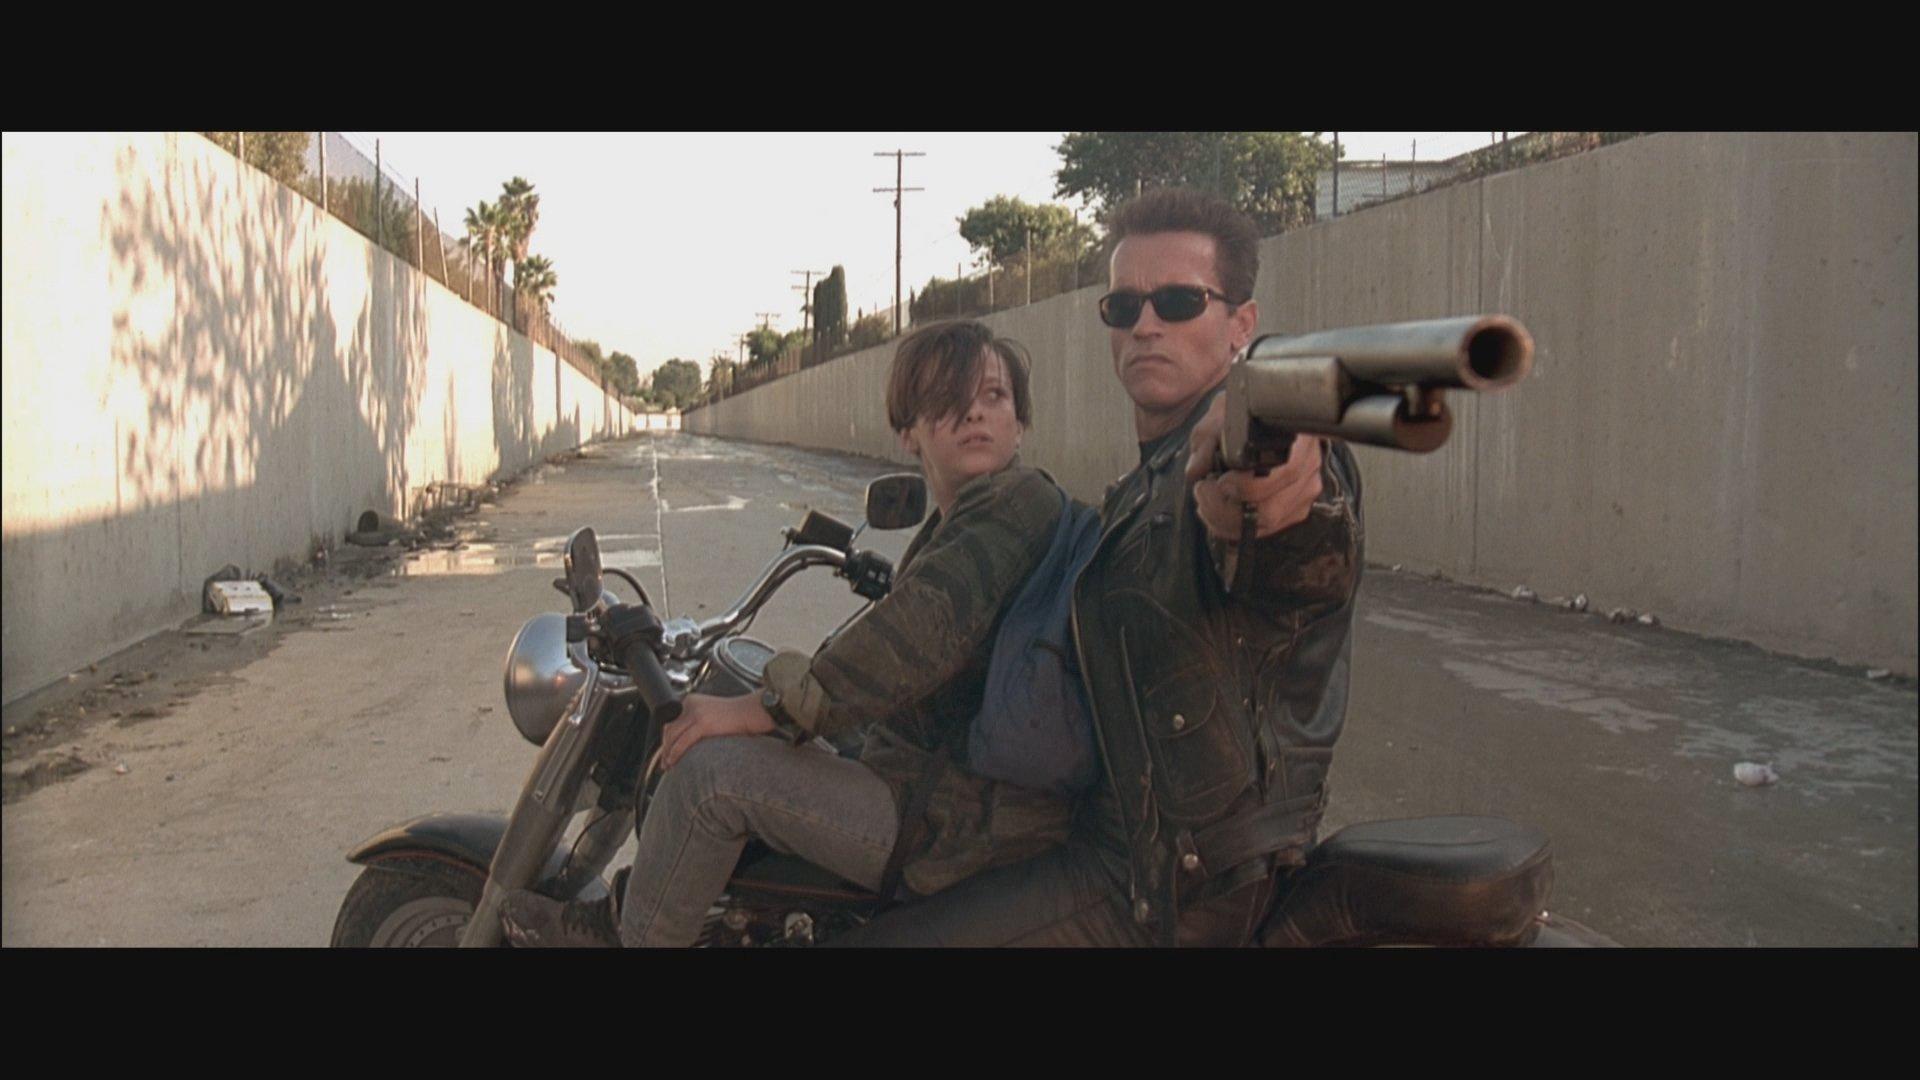 Terminator 2 judgment day hd wallpaper background image 1920x1080 id 516815 wallpaper abyss - Terminator 2 wallpaper hd ...